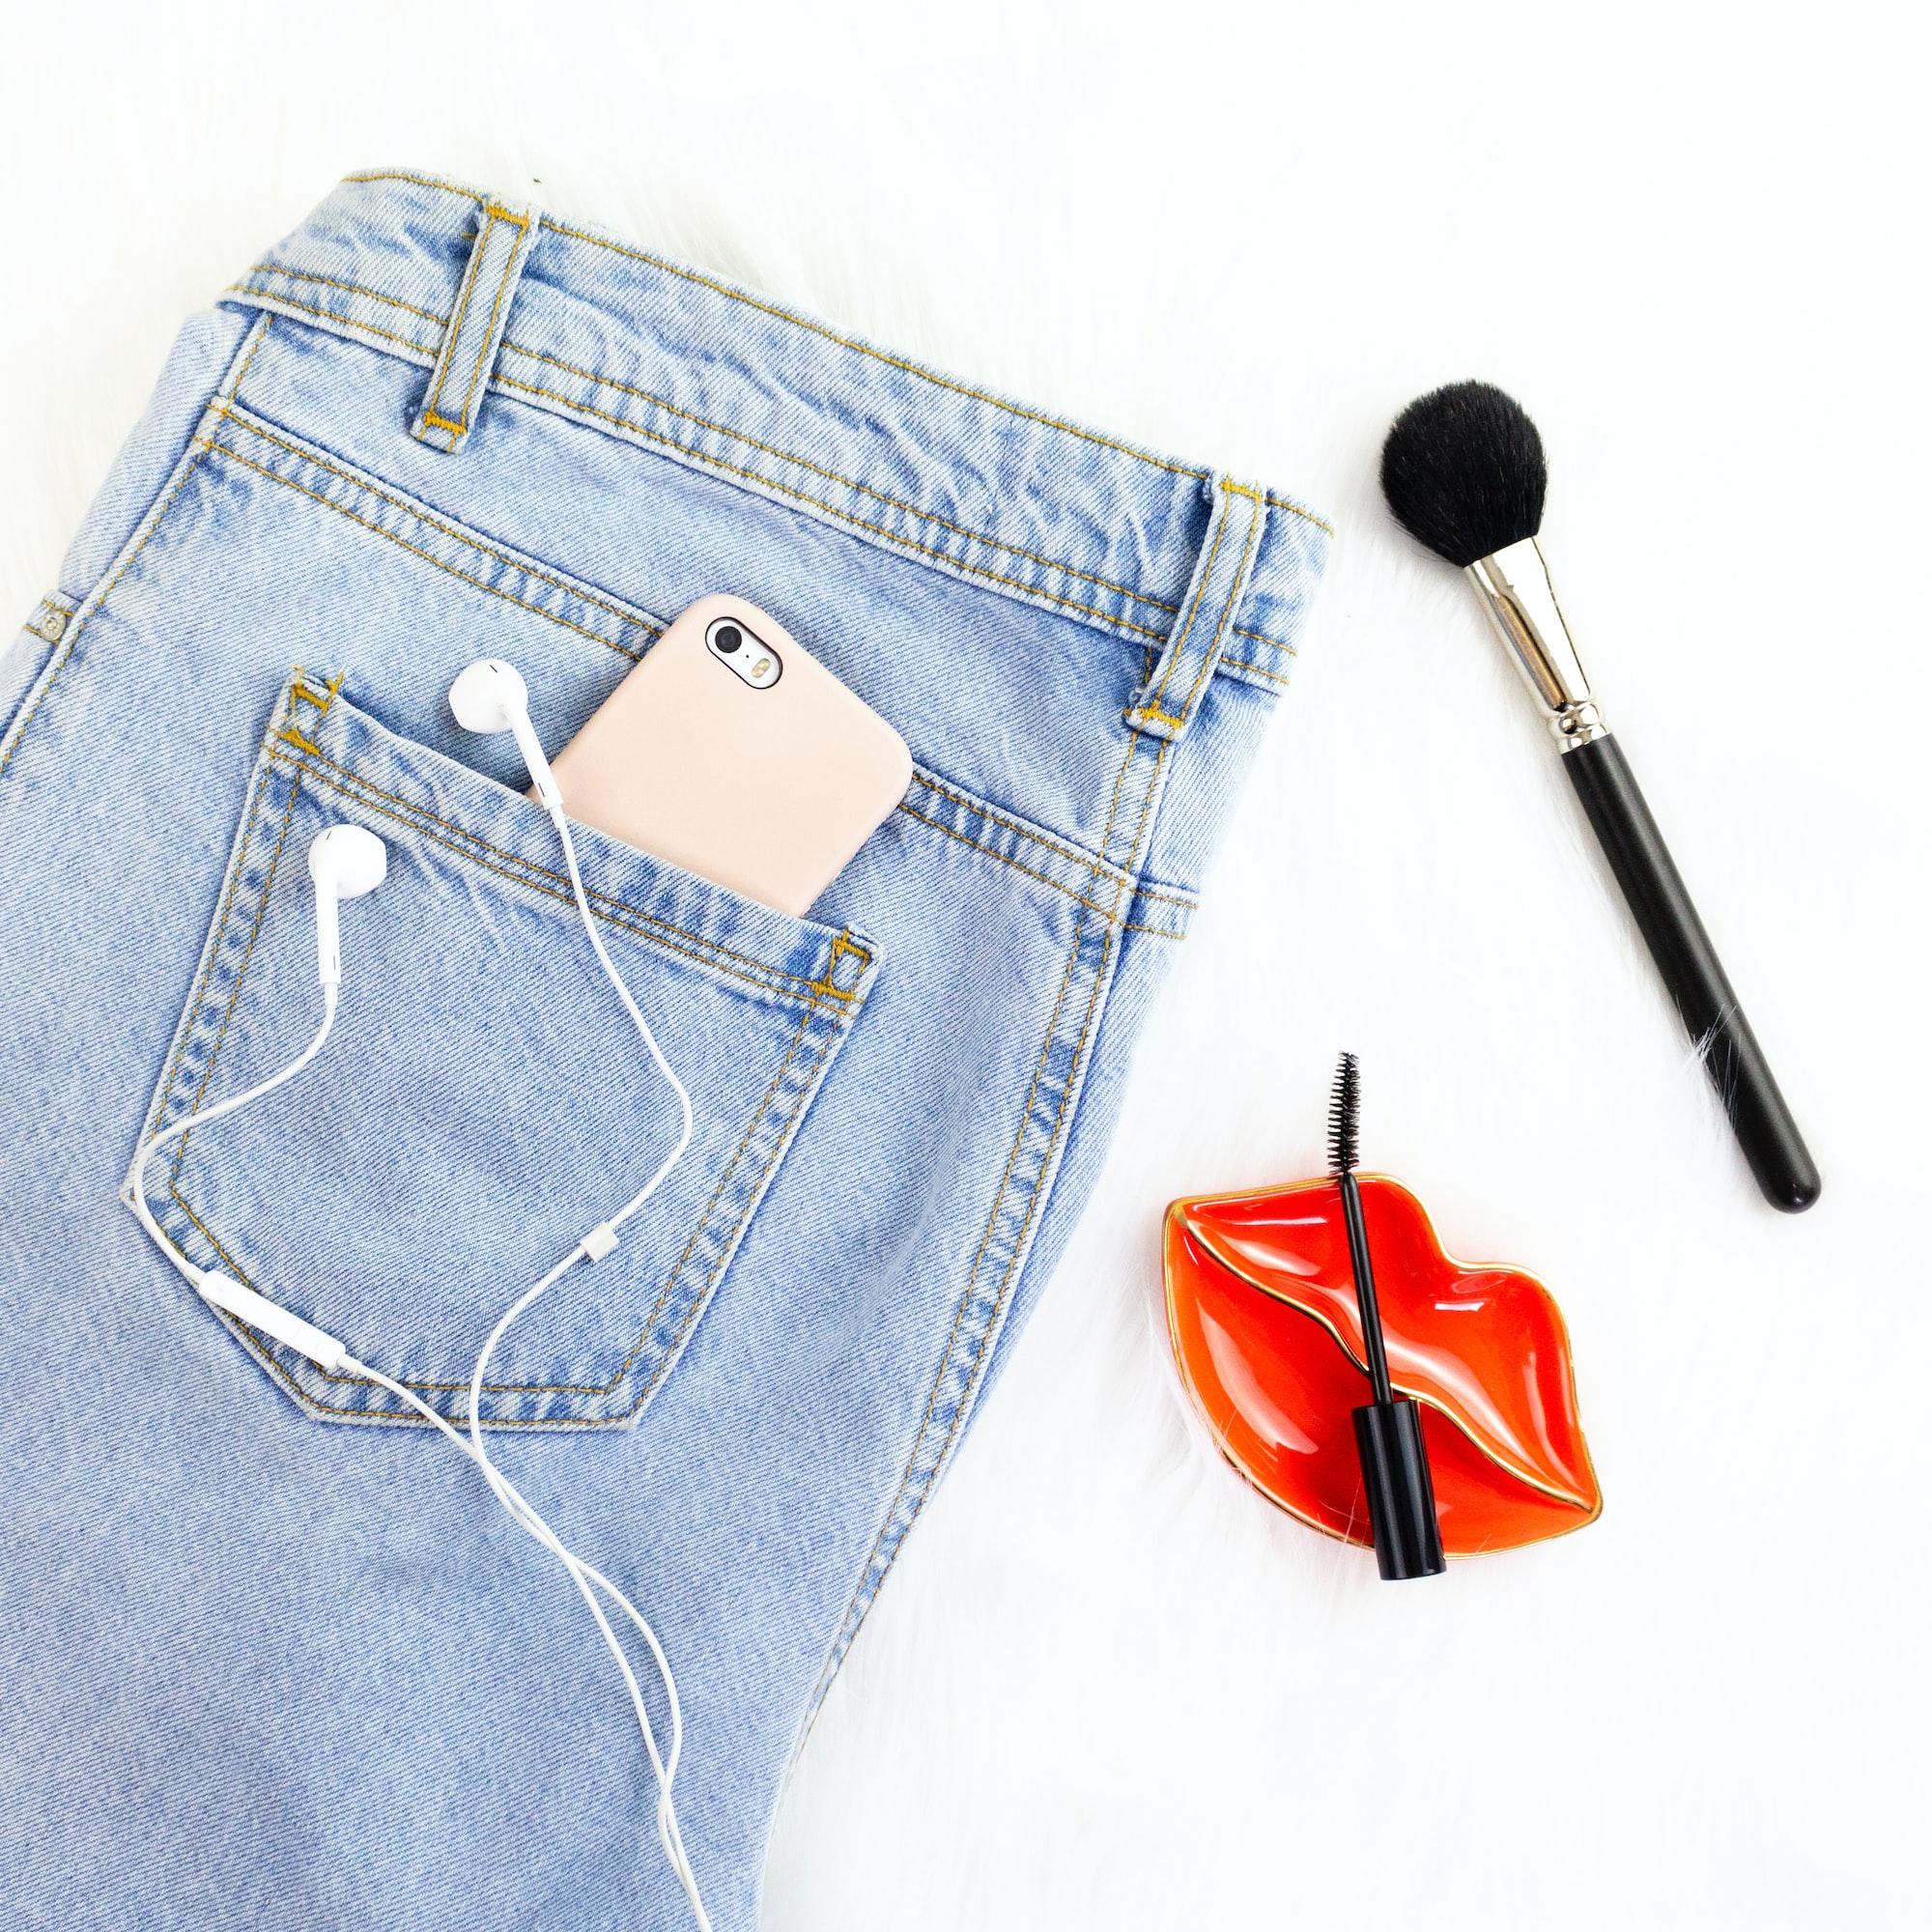 Fashion Blogger Flat Lay